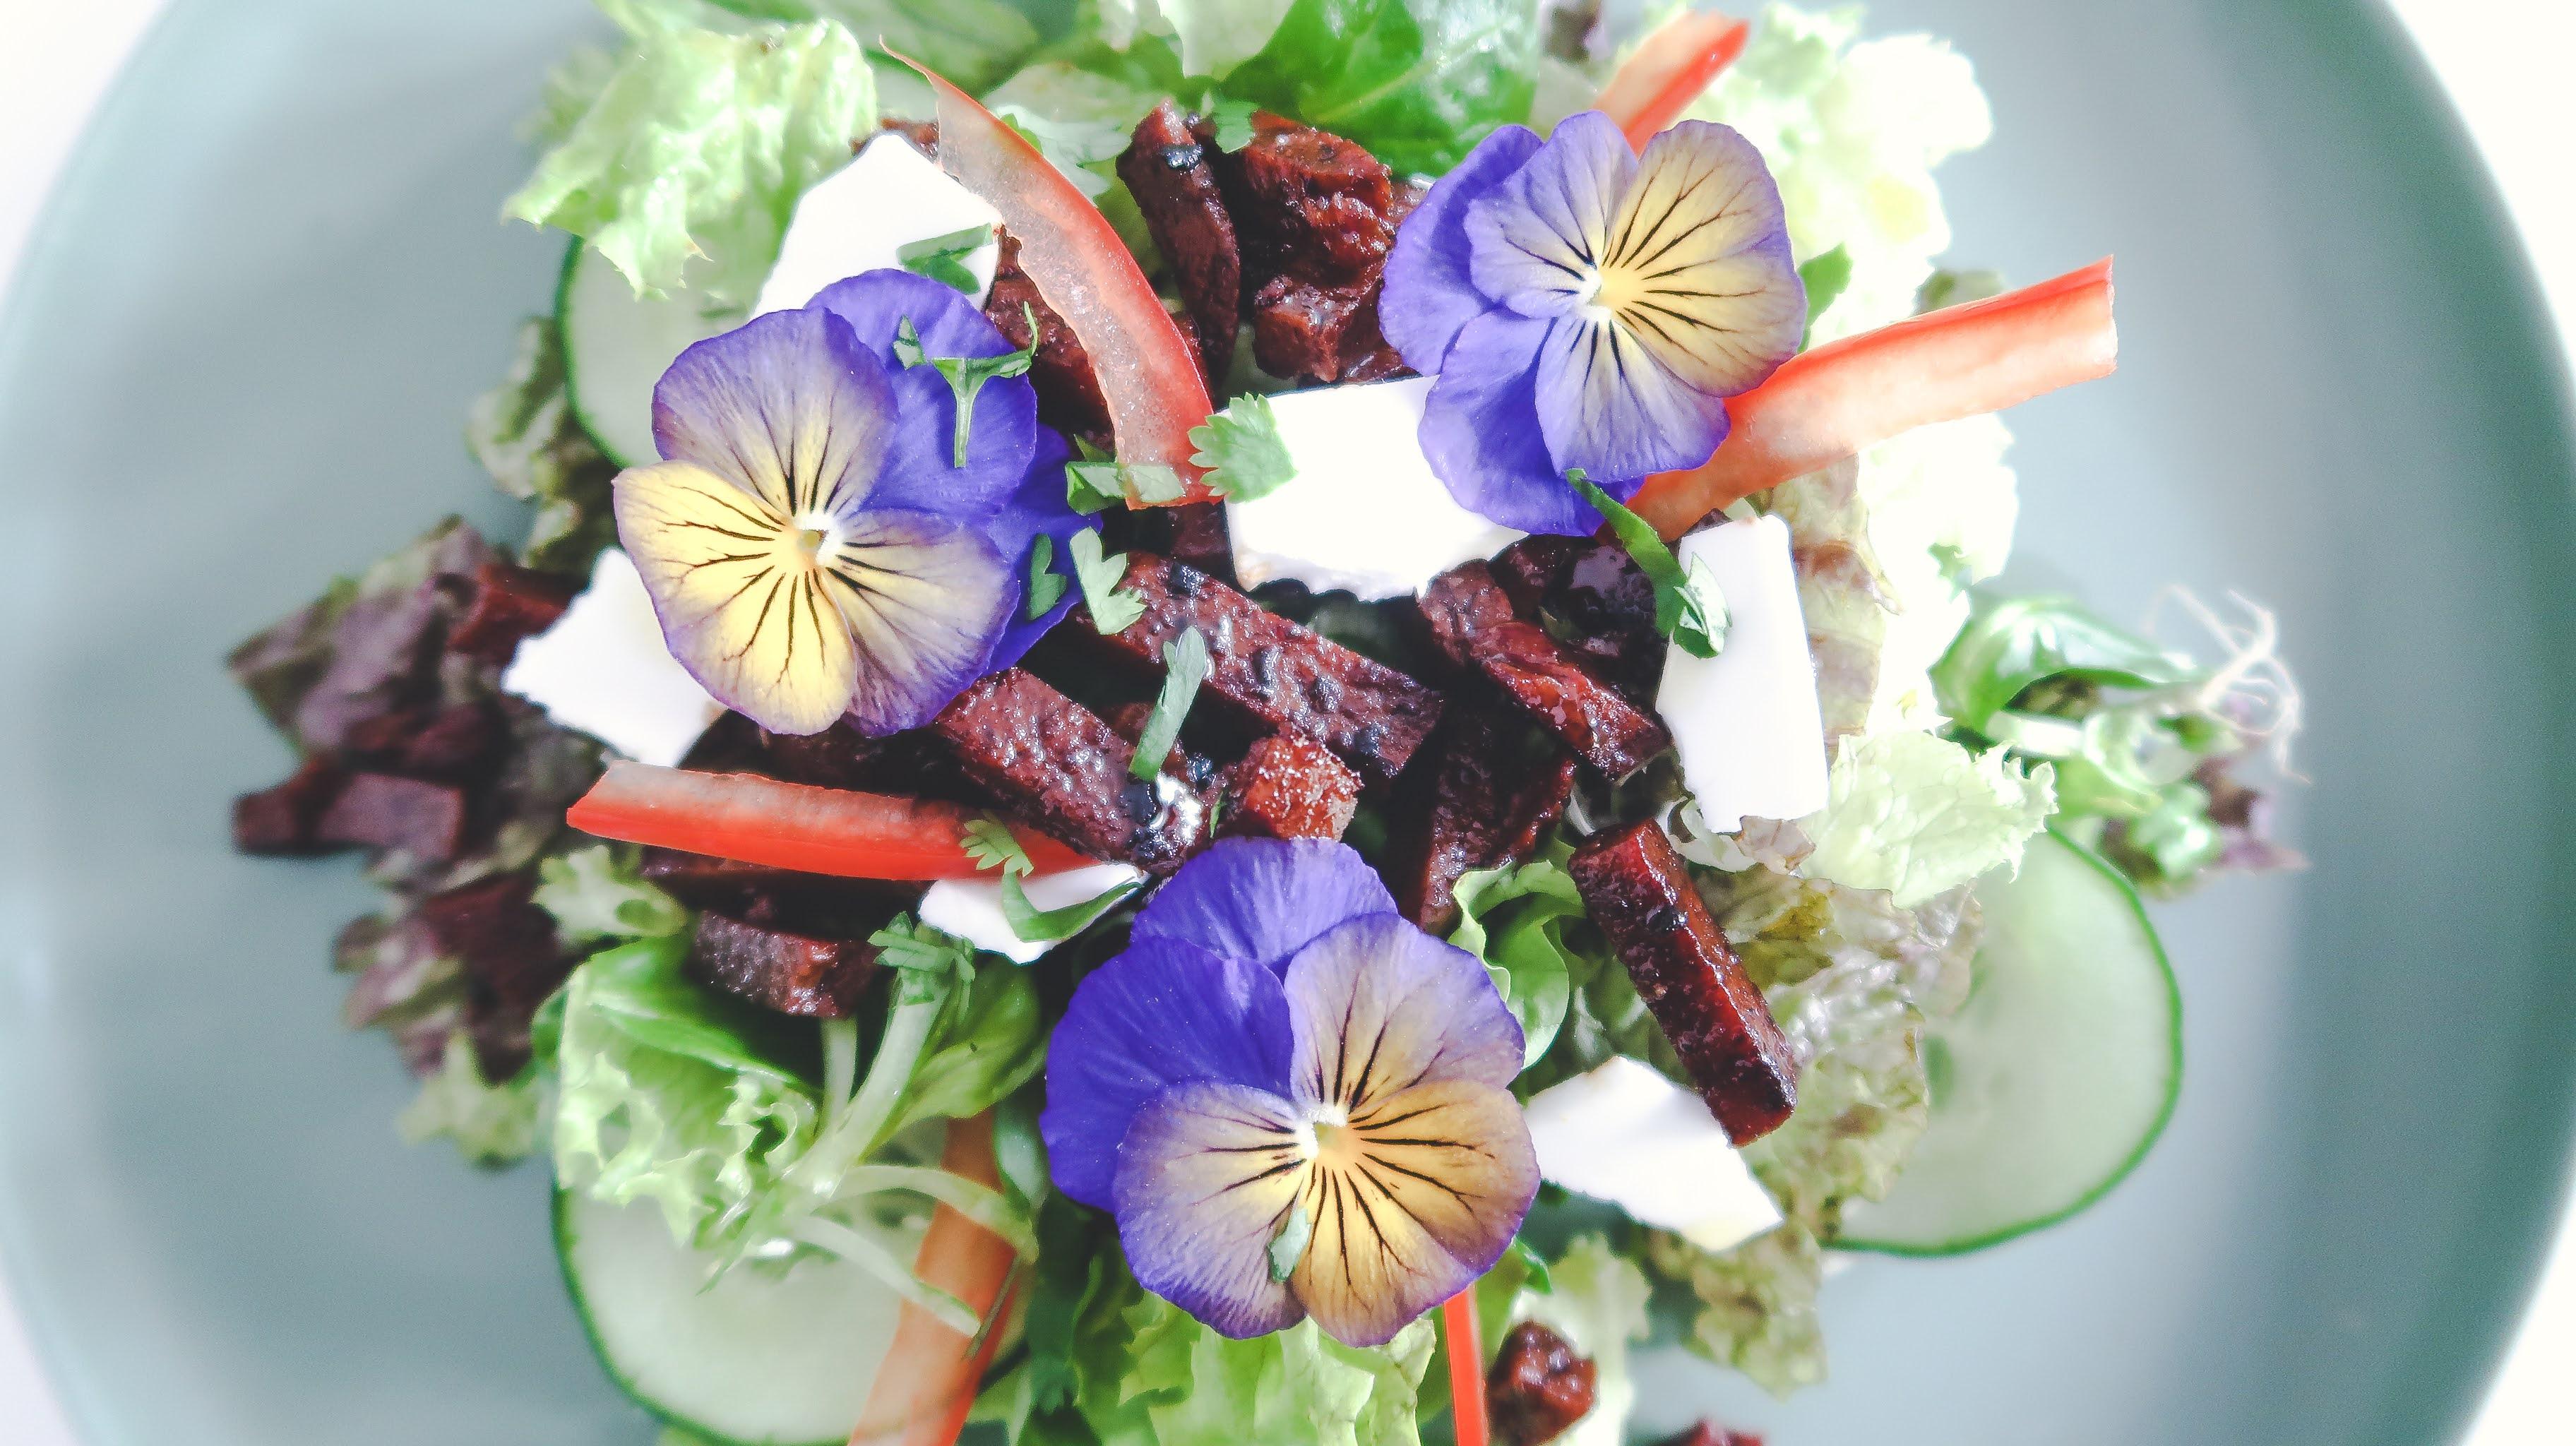 Salade met seitan 'spekreepjes'